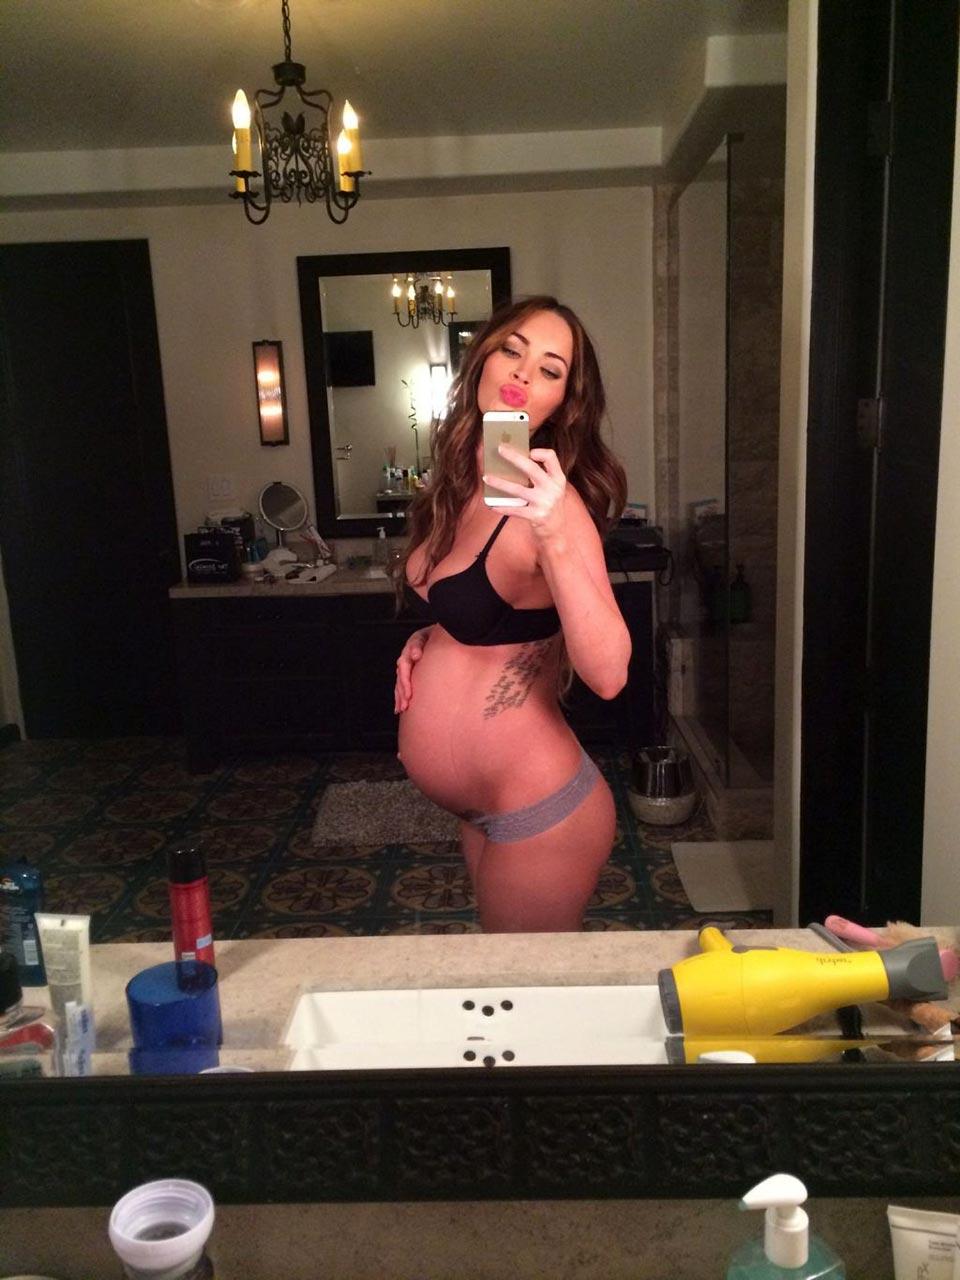 Megan Fox Nude - 512 photos (icloud leak, FHM, MAXIM